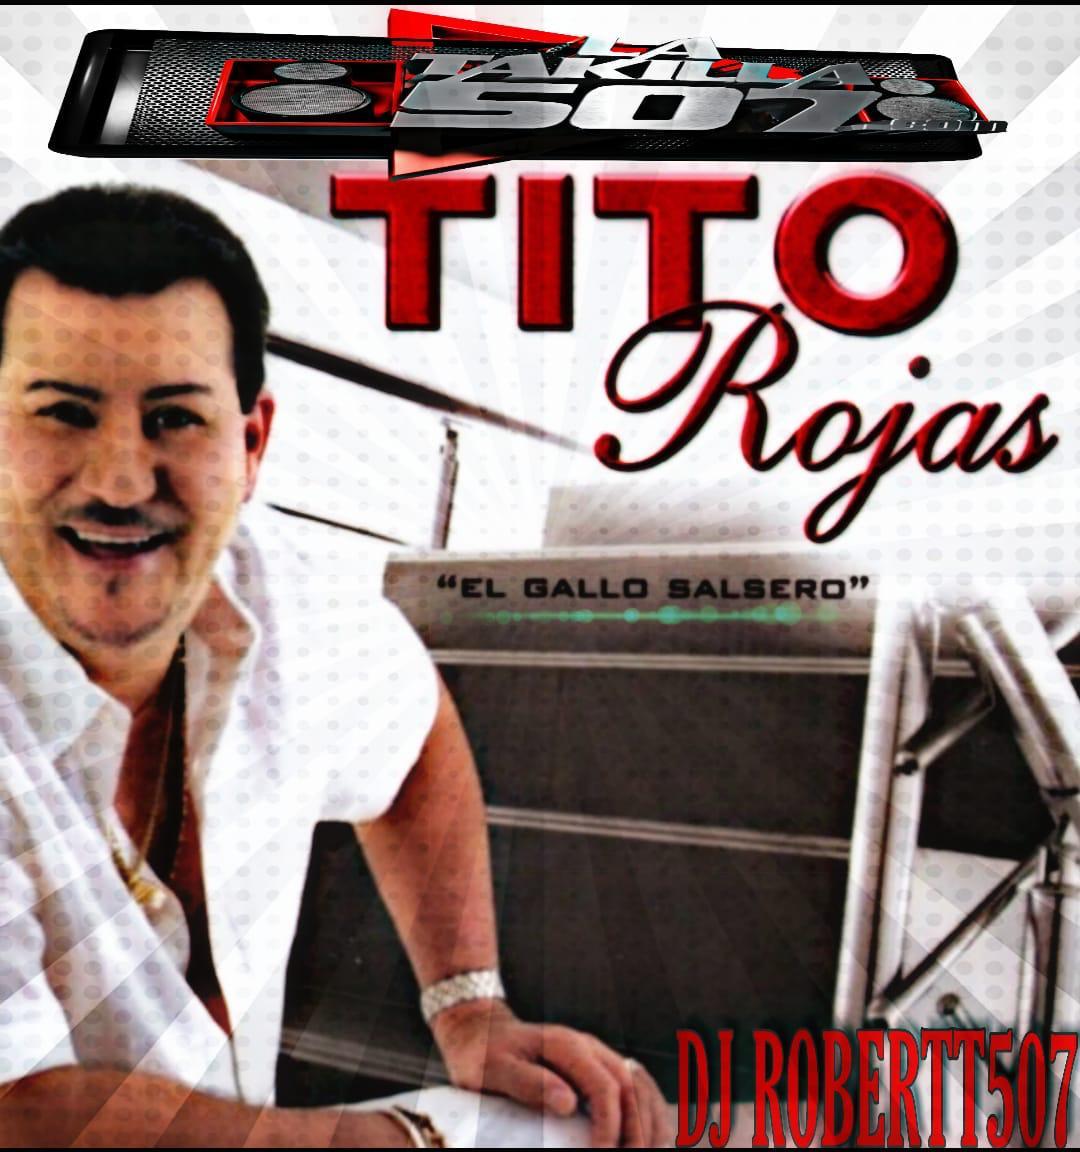 Salsa Sensual Mix 10 (Tributo a Tito Rojas) by Dj Robertt507